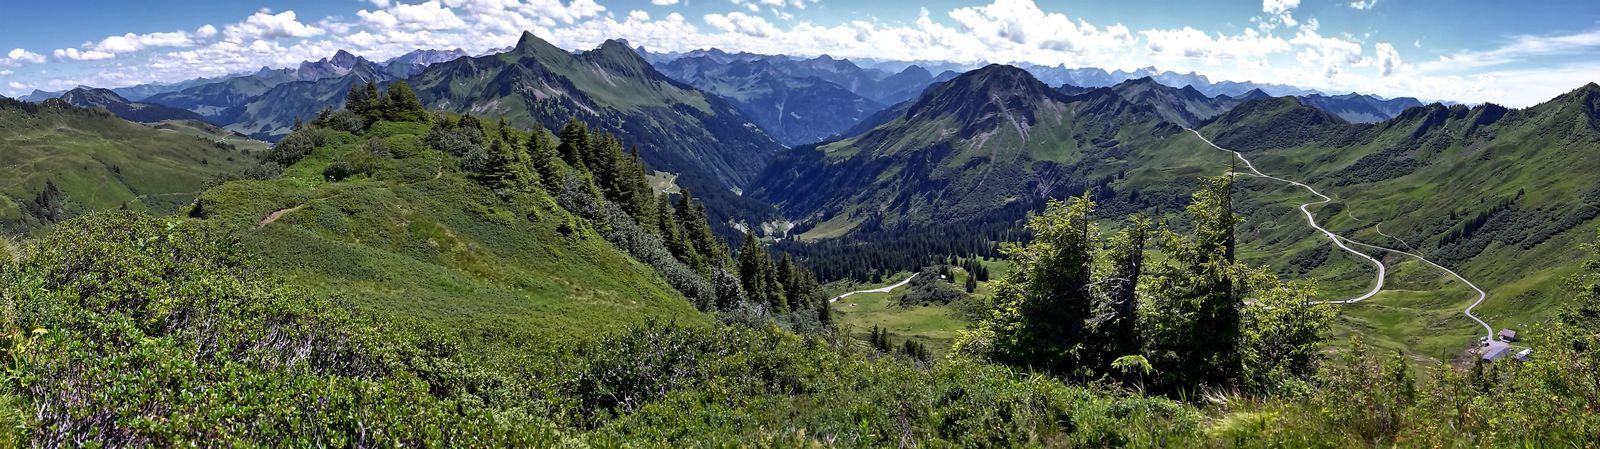 180 Grad-Panroma O-S-W vom Diedamskopf bis Fu8rkajoch/Gerafalben